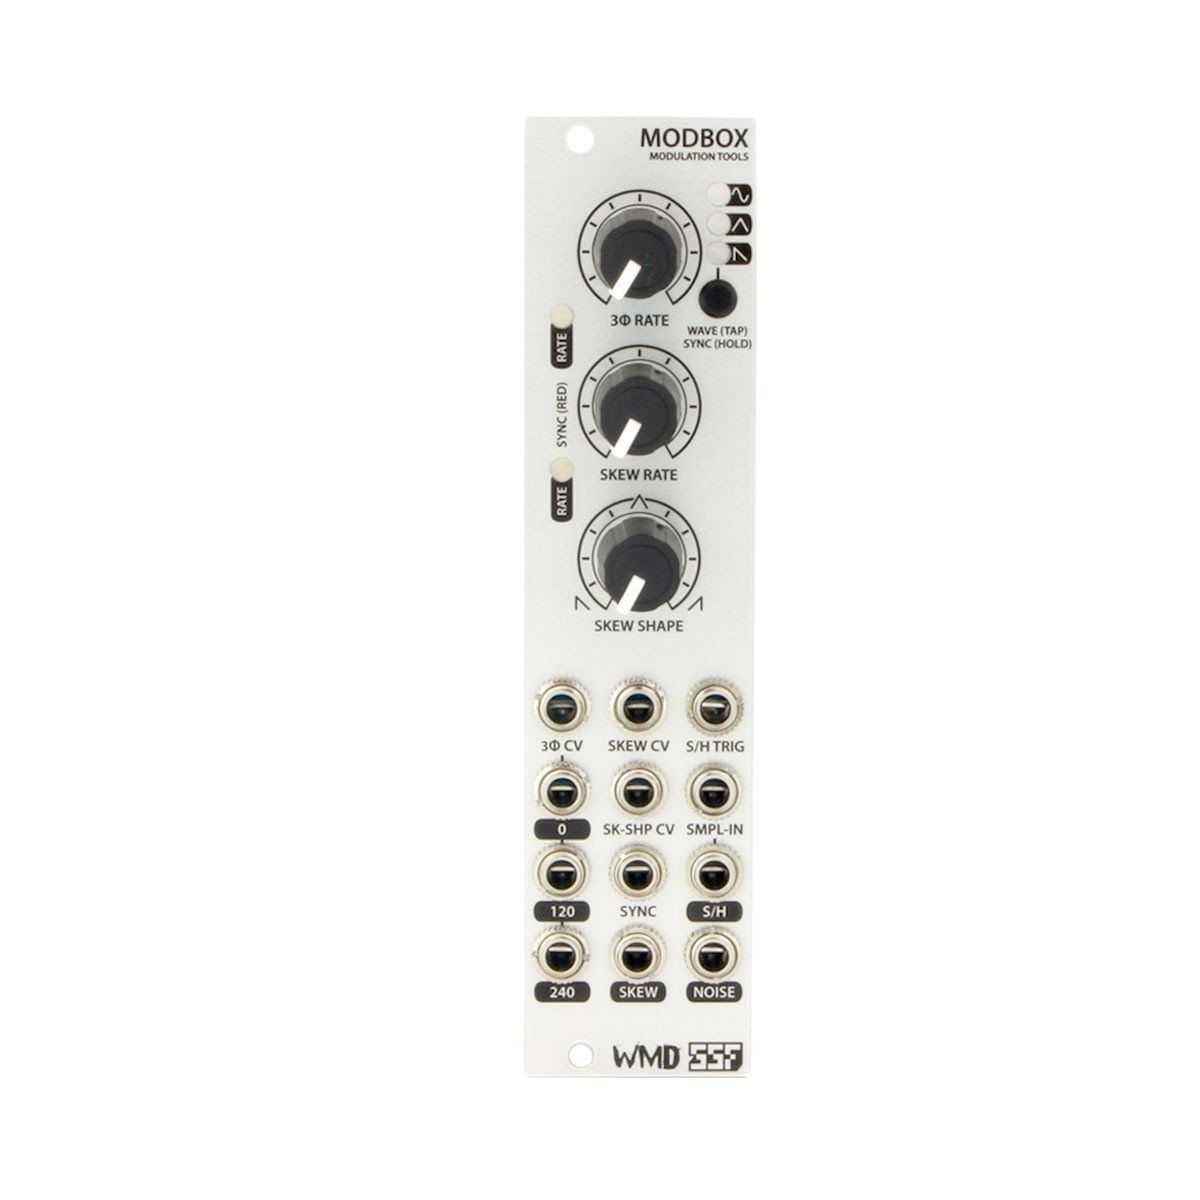 WMD/SSF Modbox Eurorack LFO Module